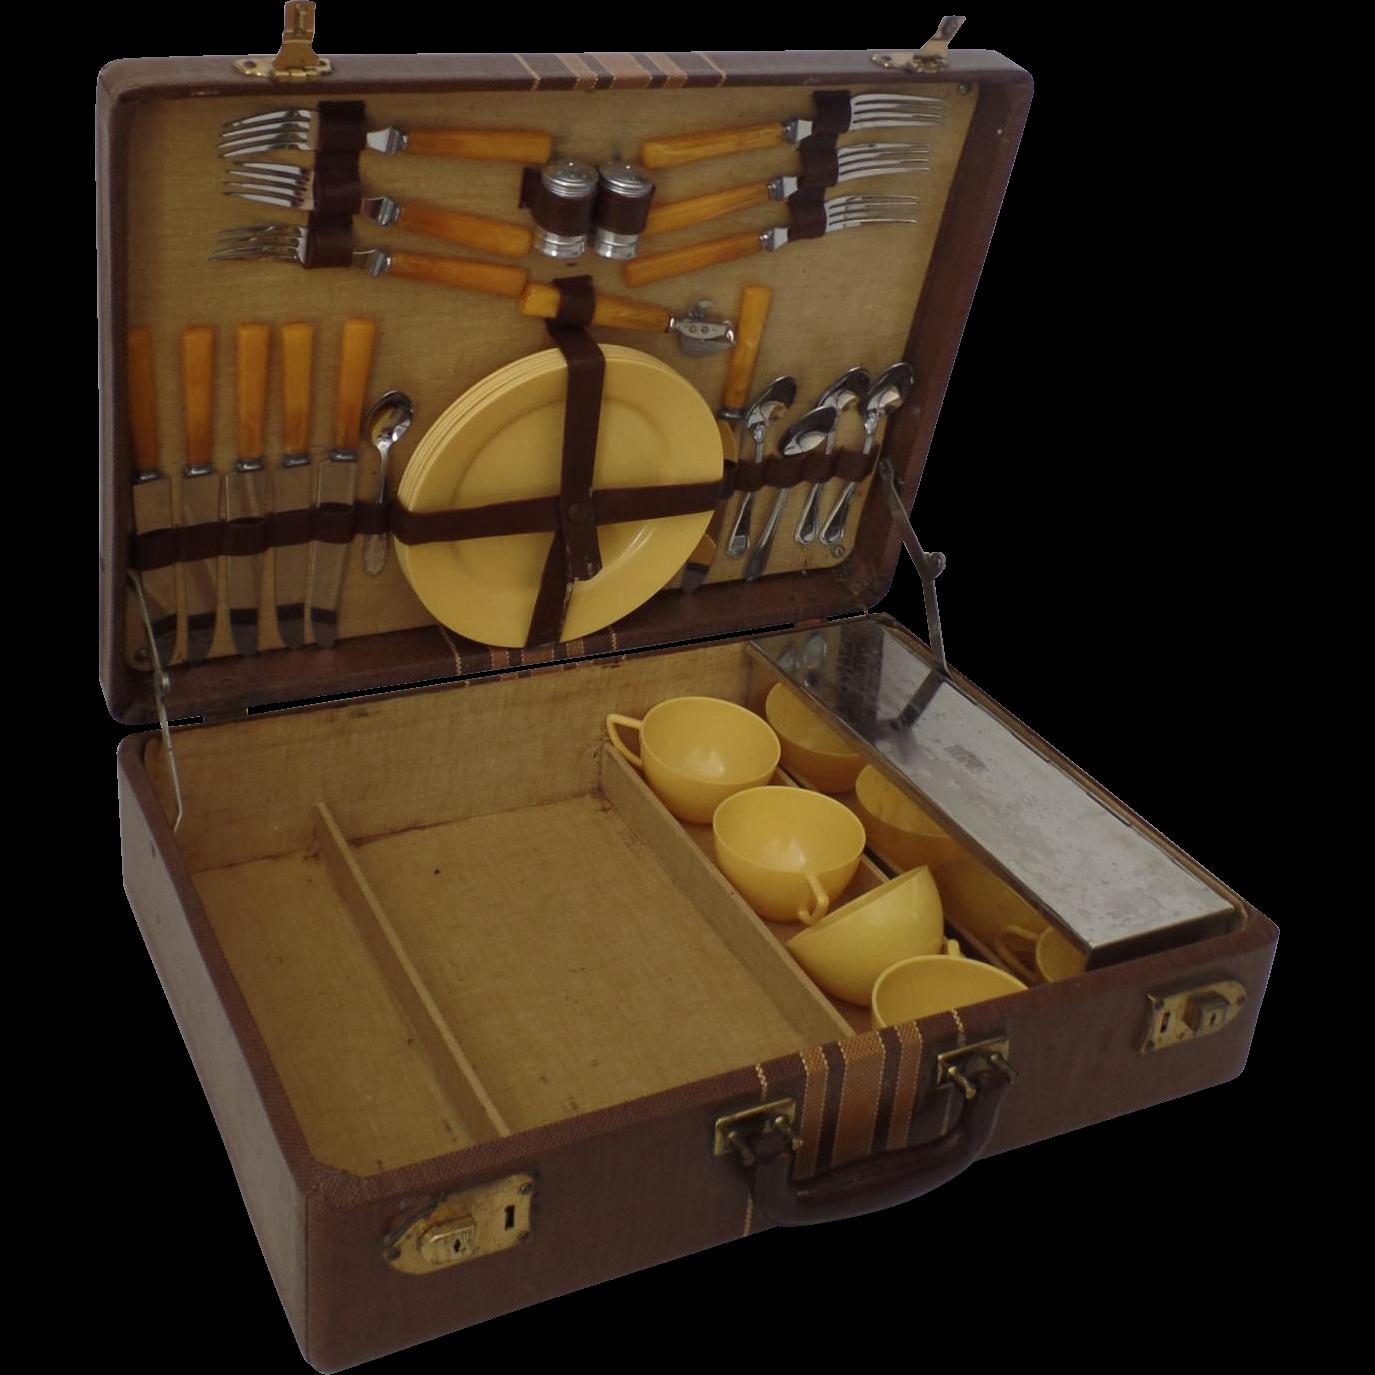 Vintage 1940s Picnic Basket Set Suitcase Yellow Bakelite Airstream ...